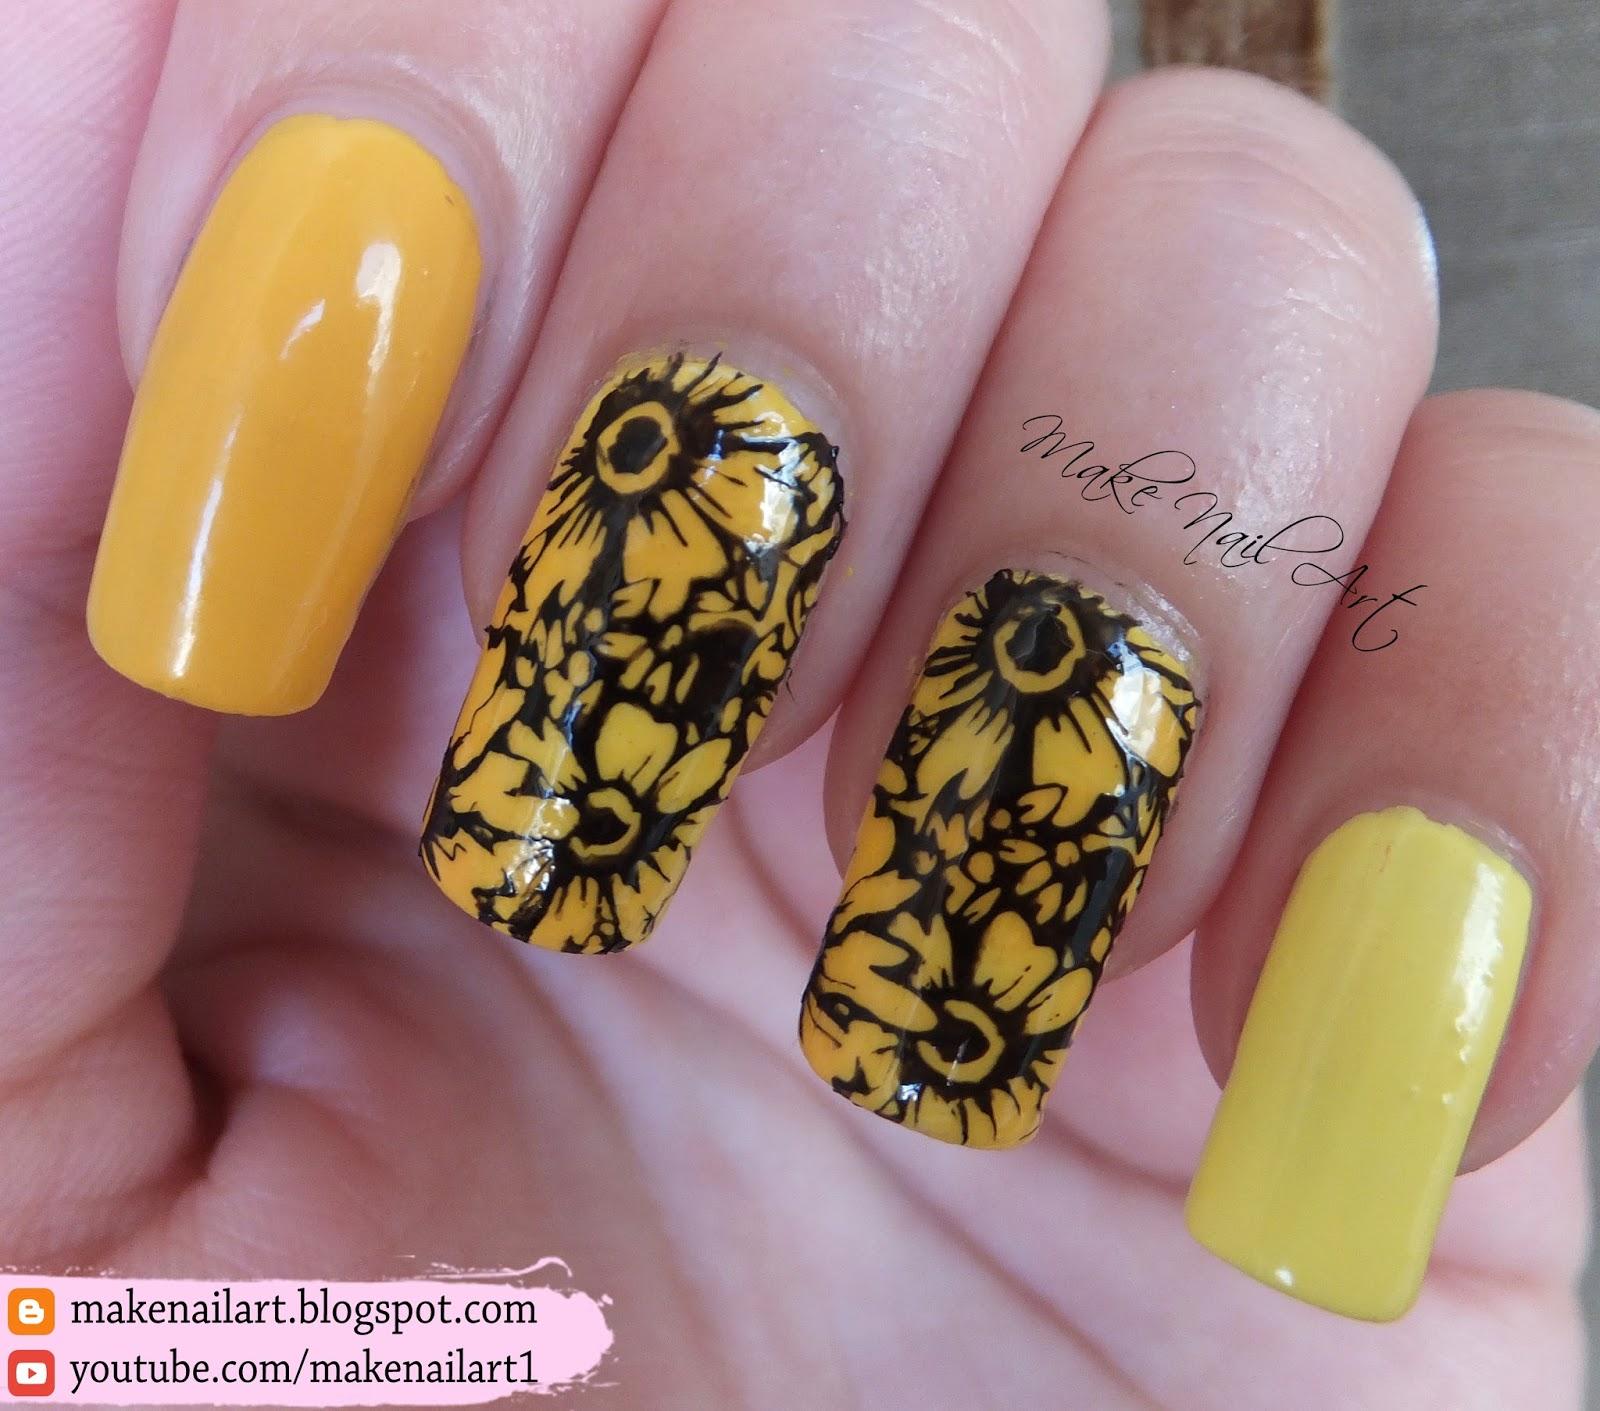 Make Nail Art Summer Stamping Flowers Nail Art Design Tutorial